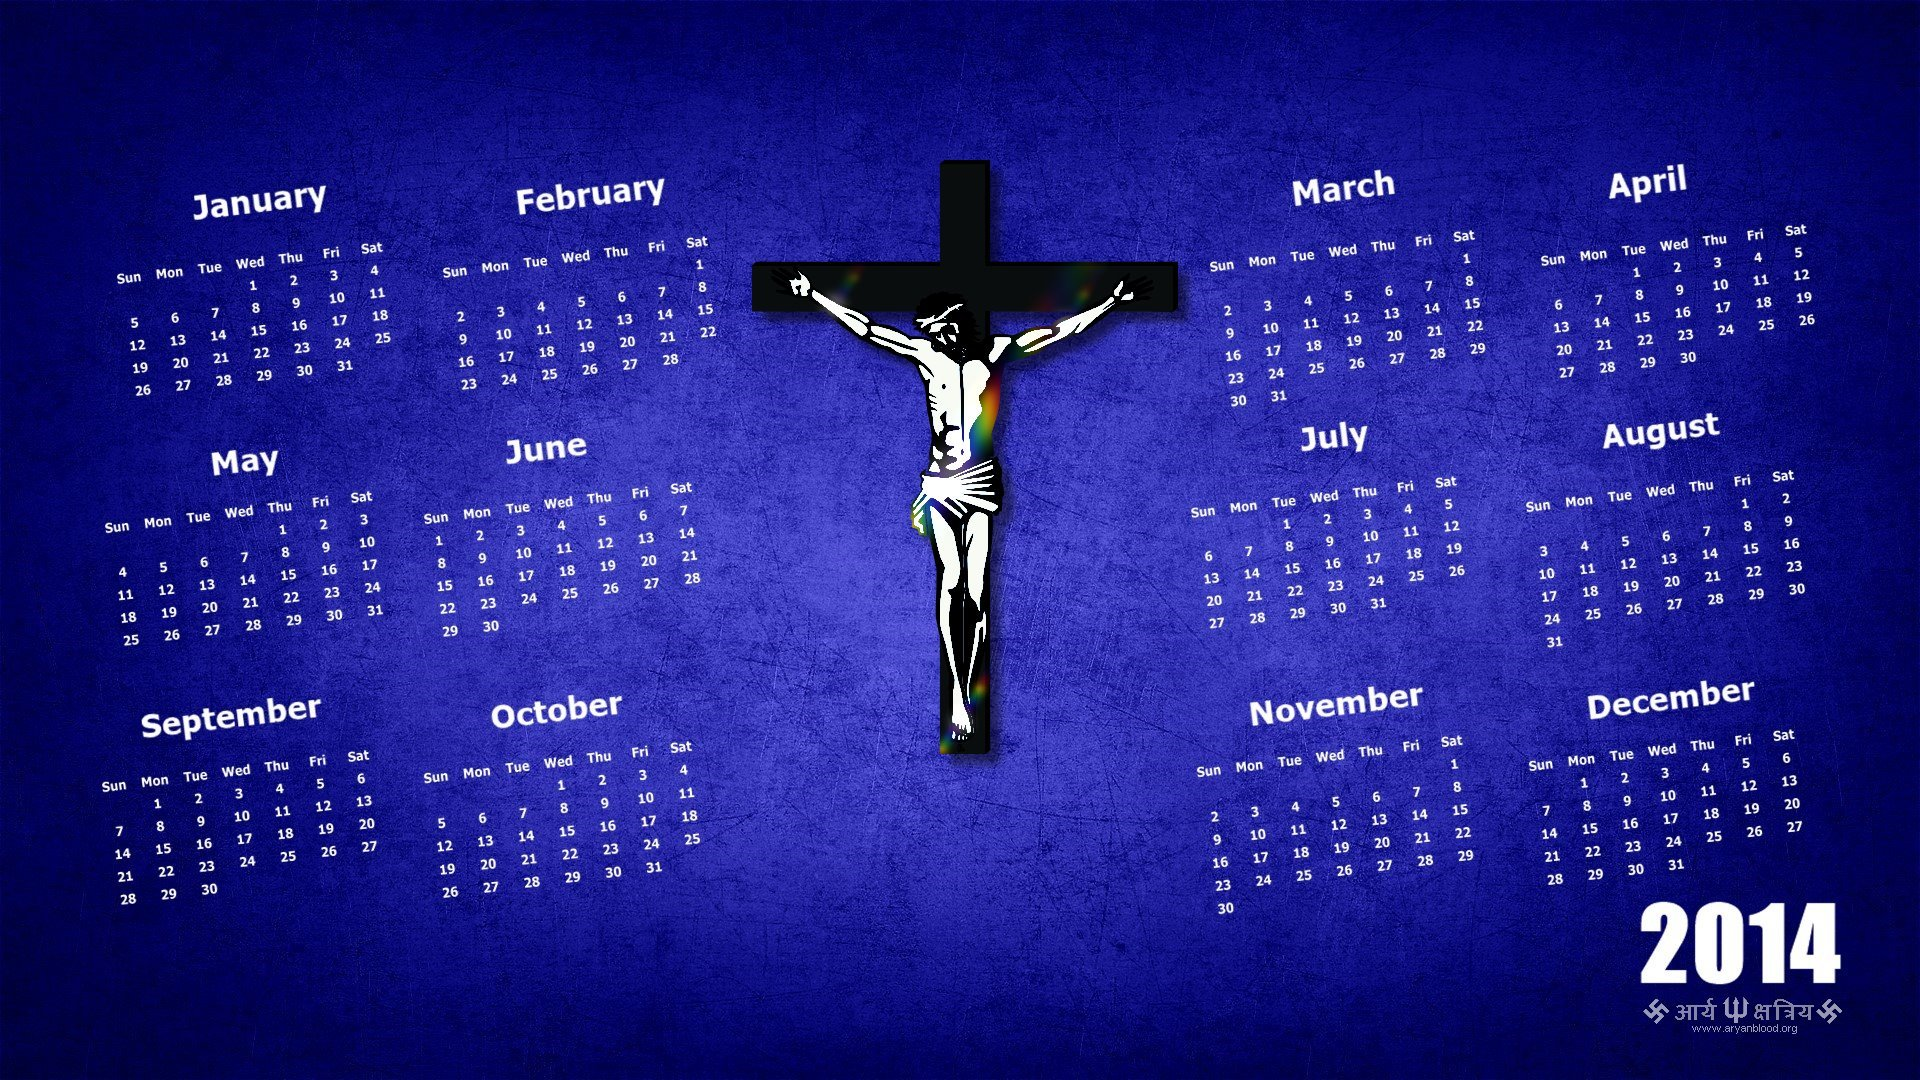 2014 Calendar Wallpaper Download HD Wallpapers 1920x1080